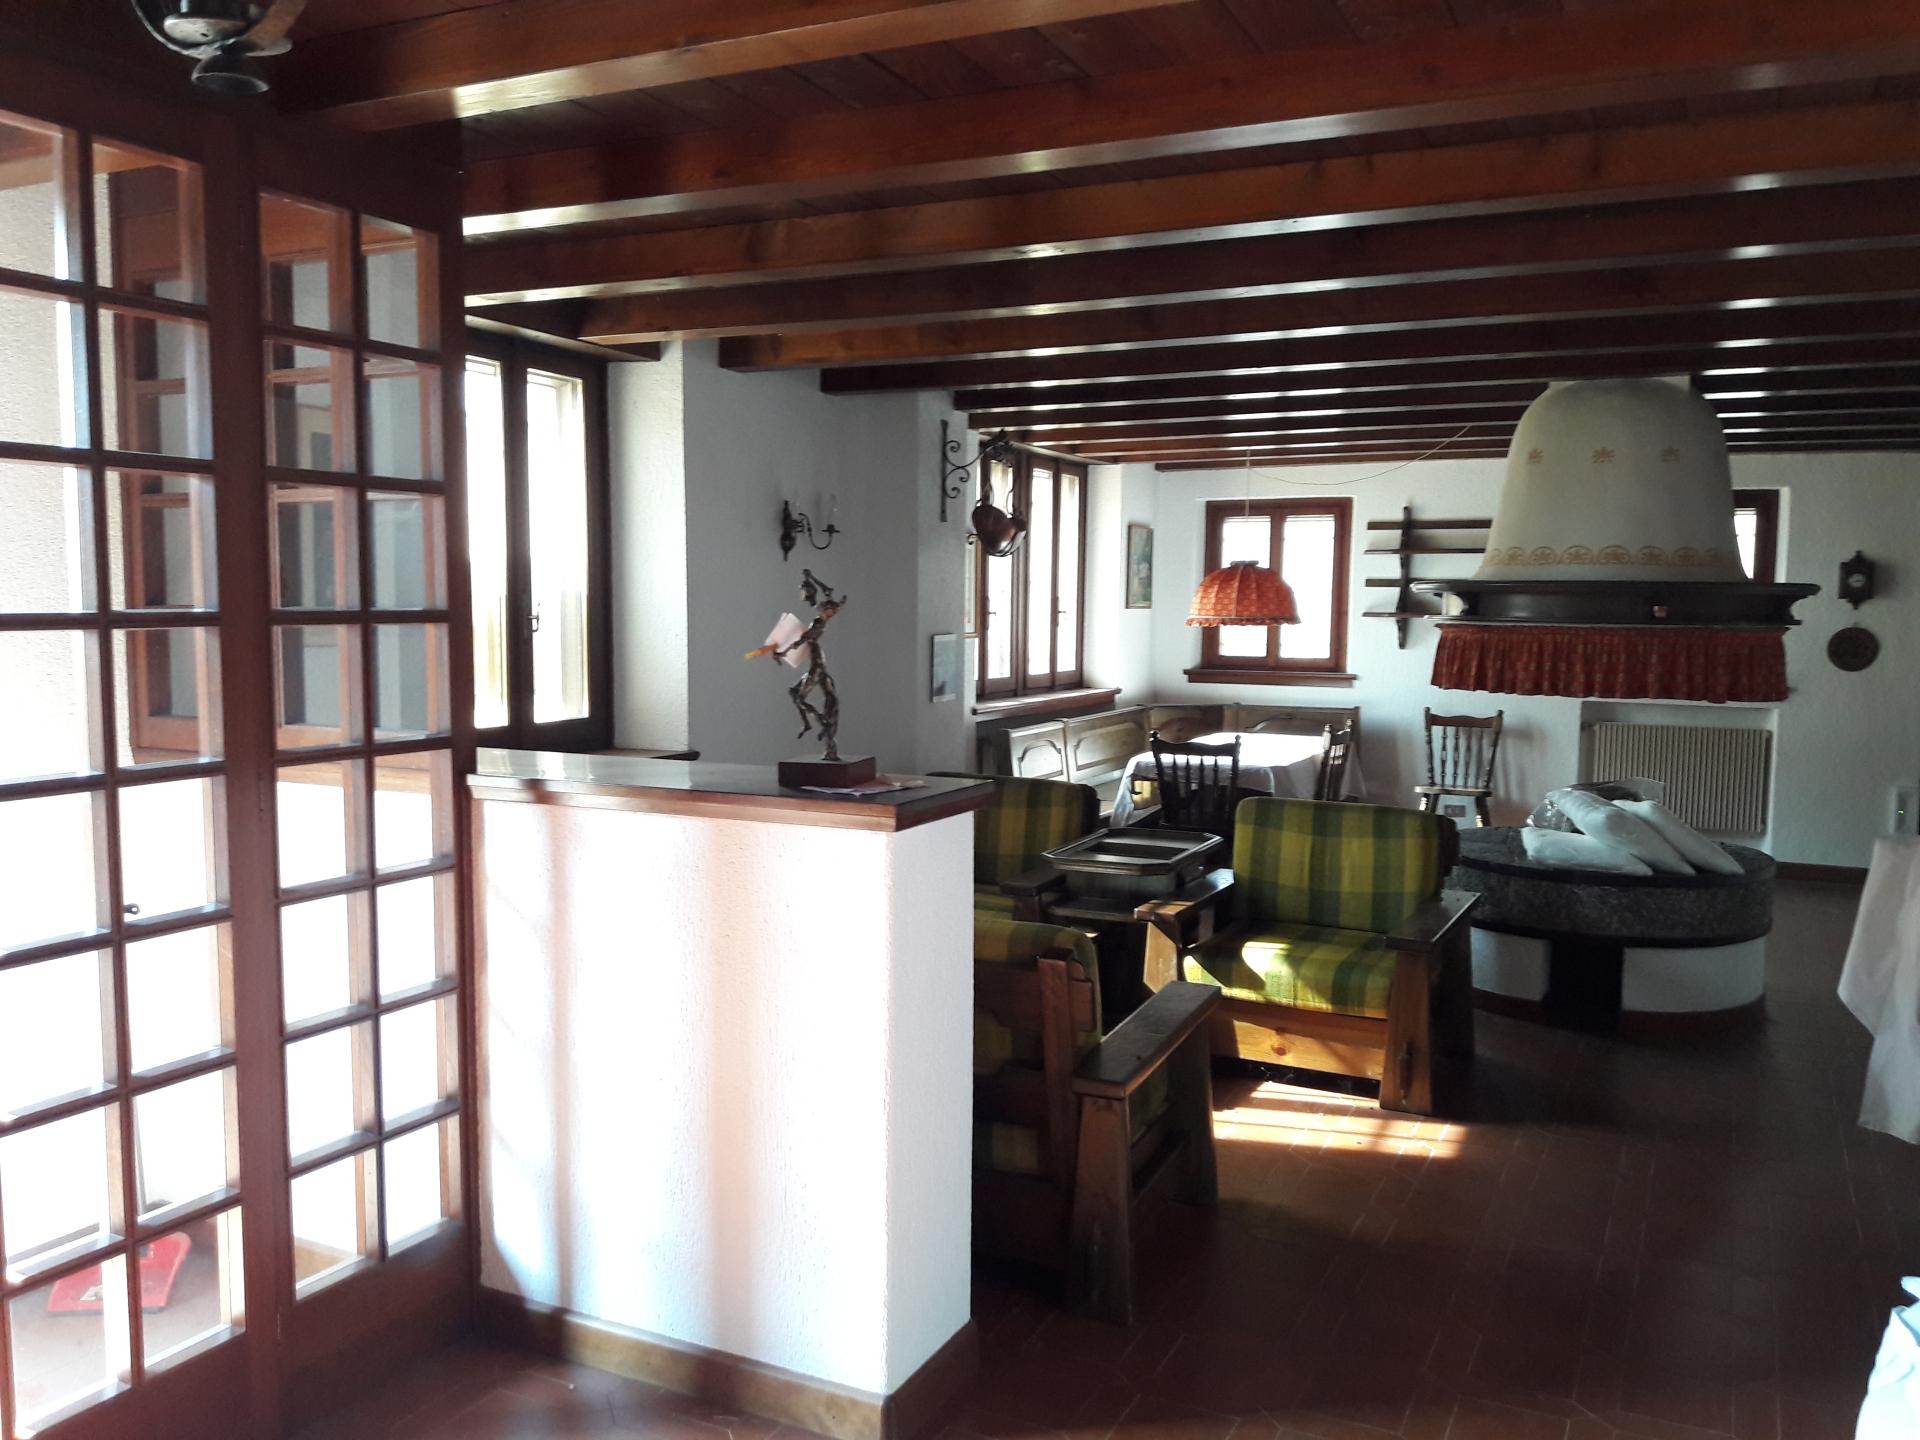 Casa in vendita a San Daniele del Friuli - Slideshow 3